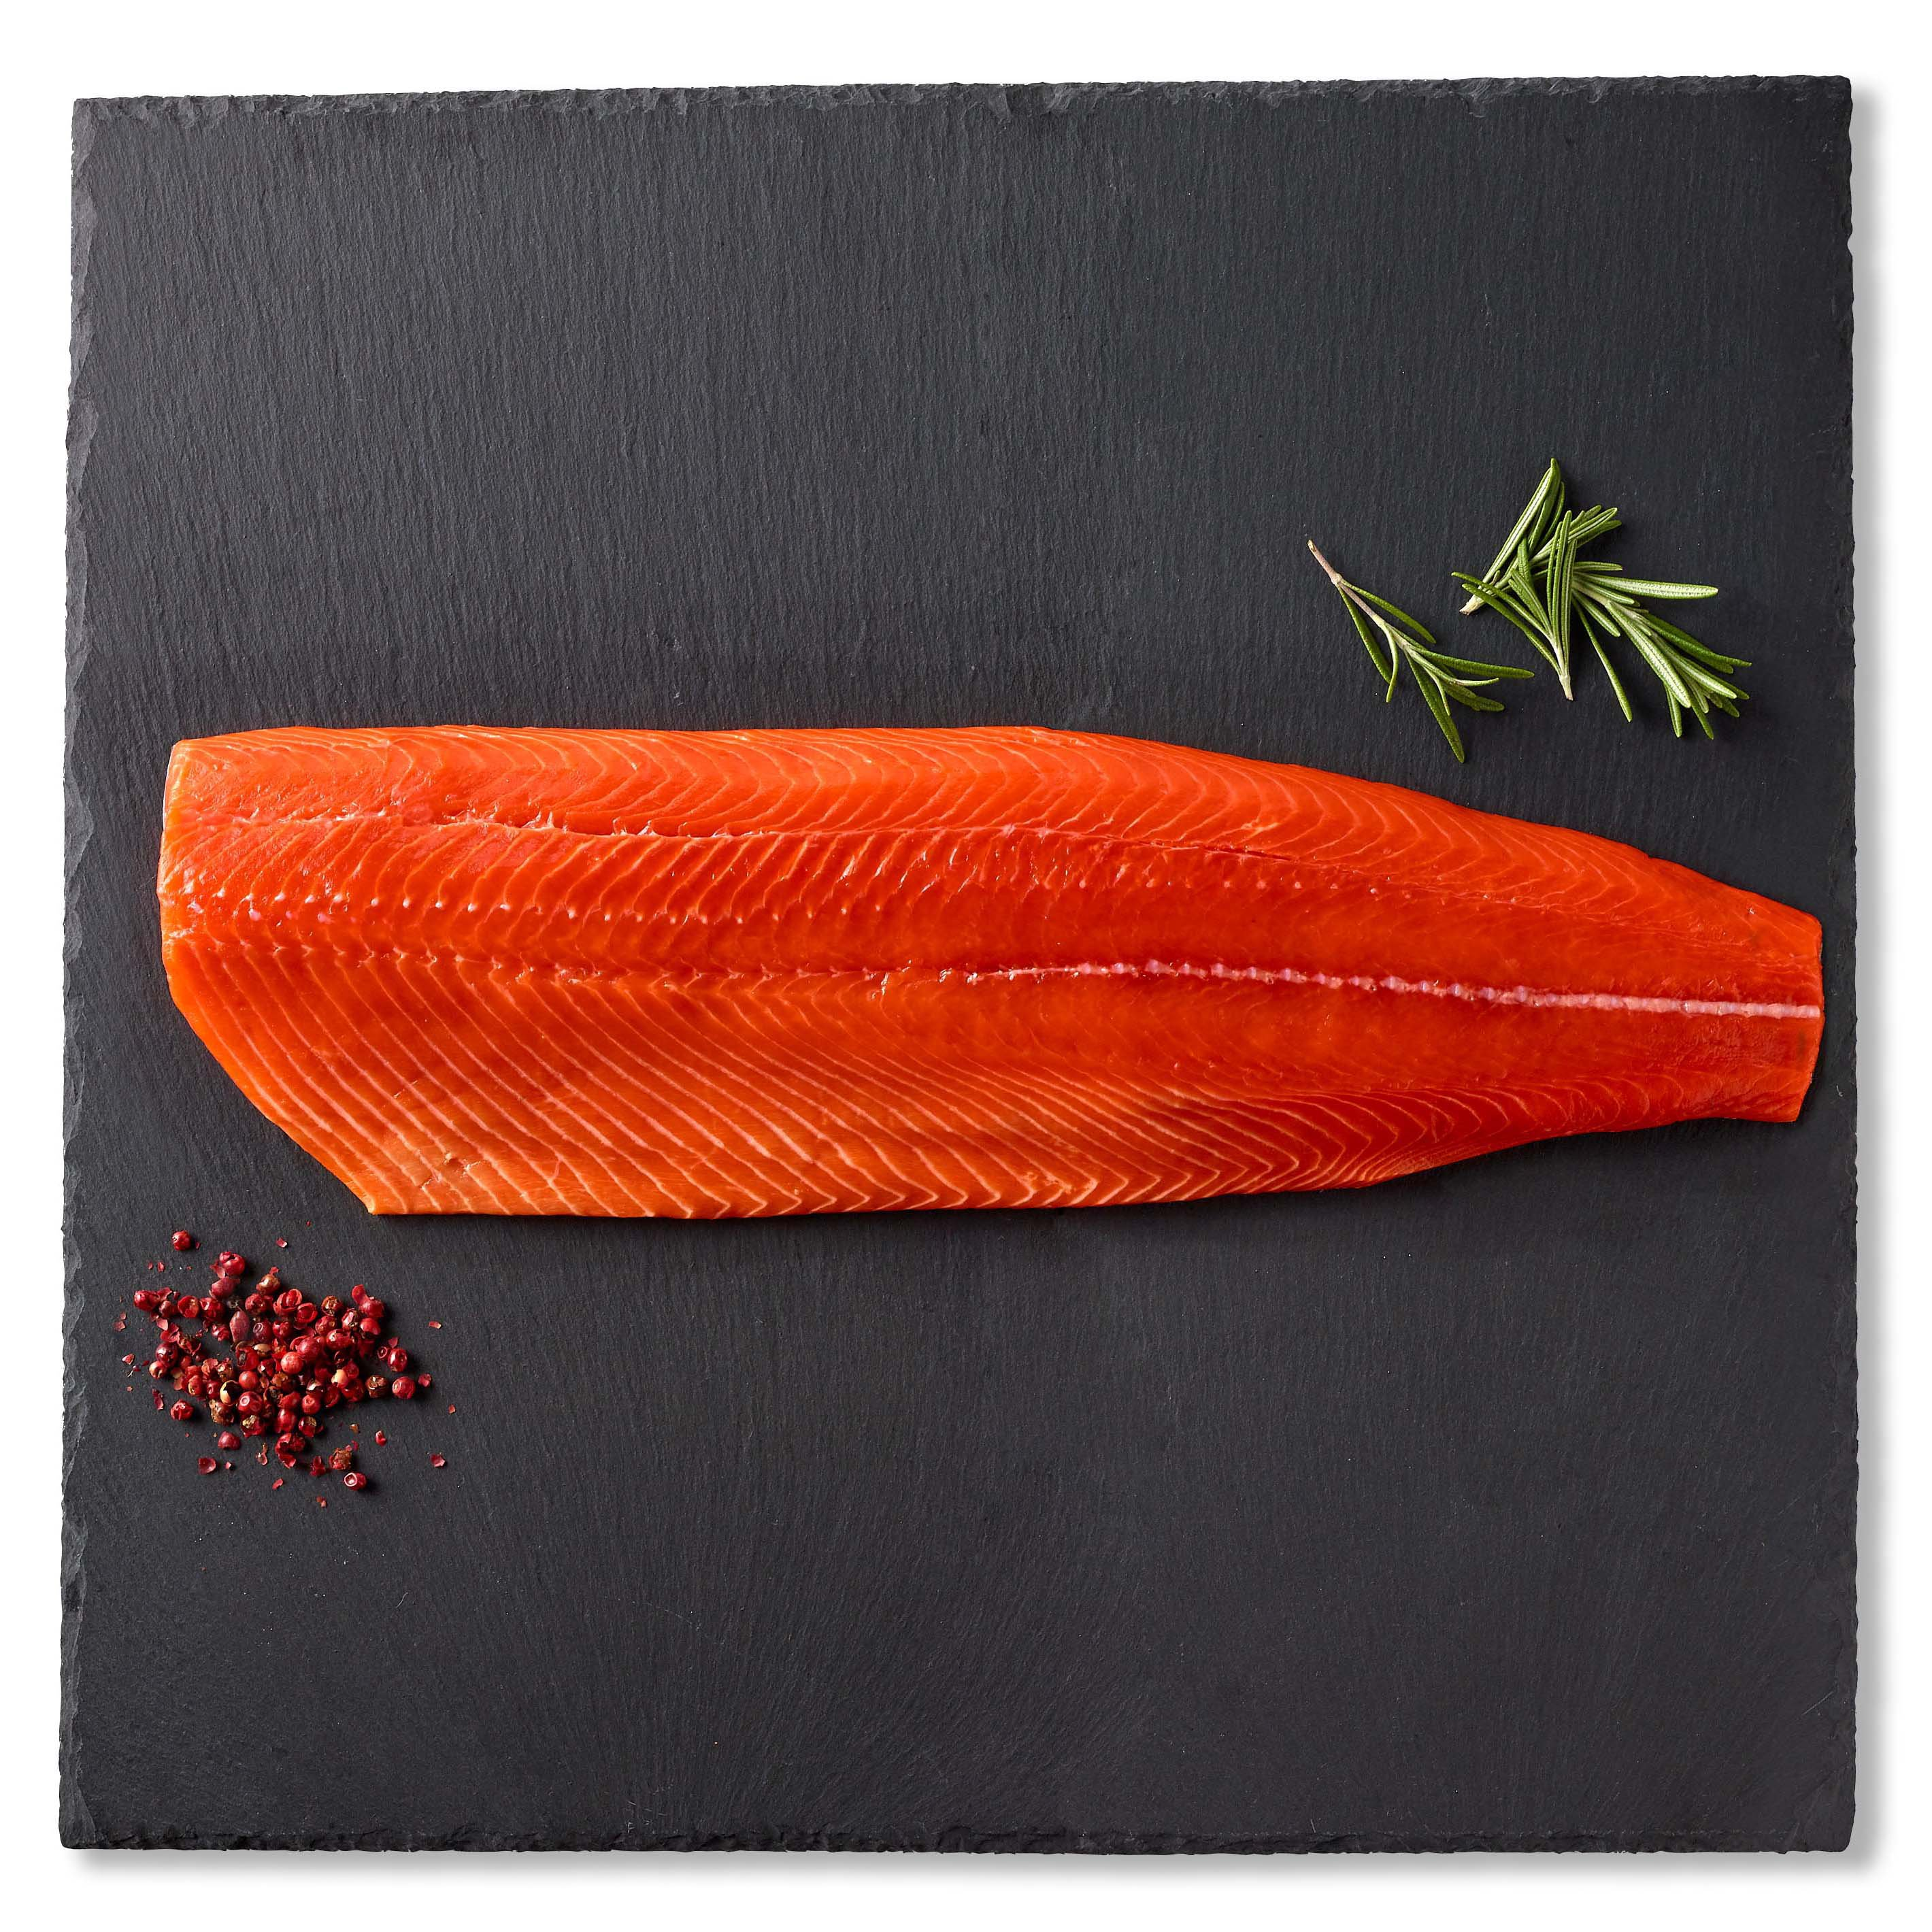 Fresh Alaska Sockeye Salmon Fillet, Wild Caught - Shop Fish at HEB